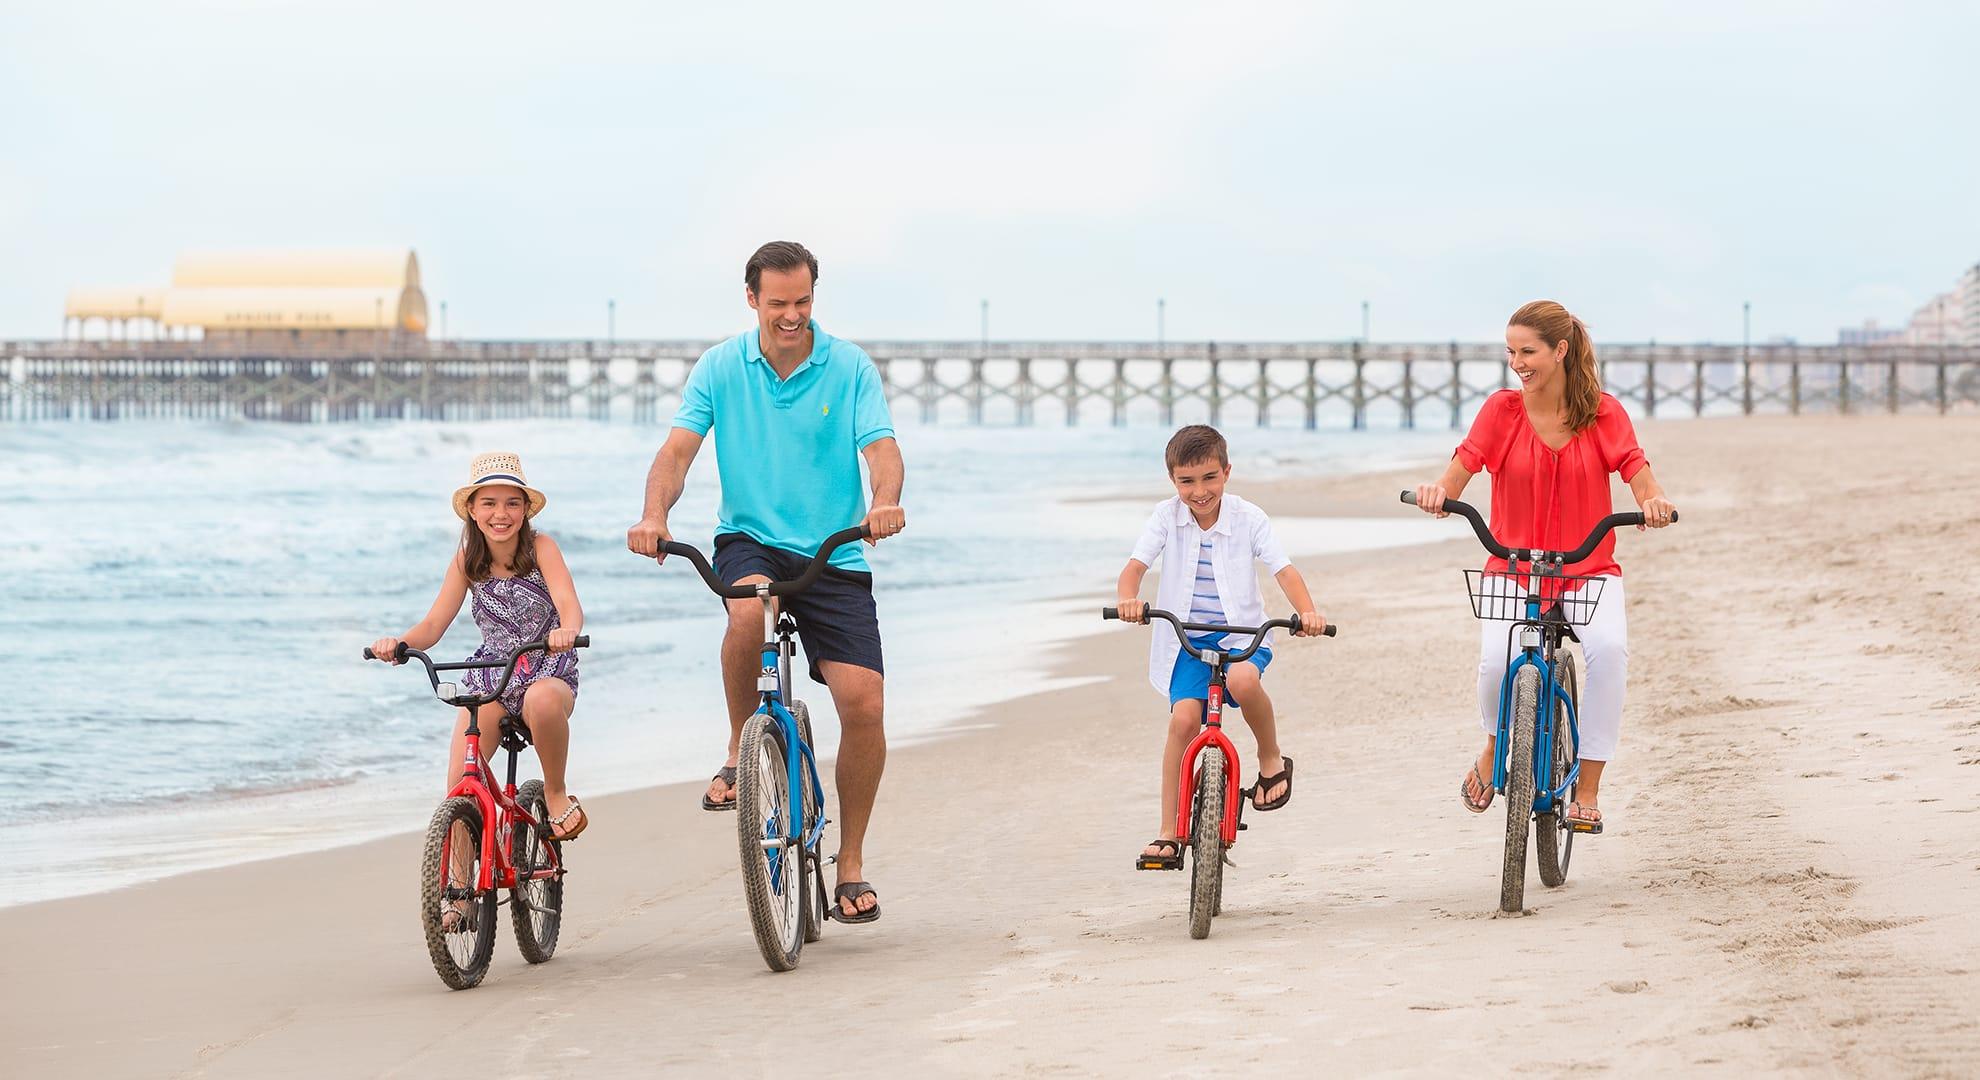 family-on-bikes-beach.jpg